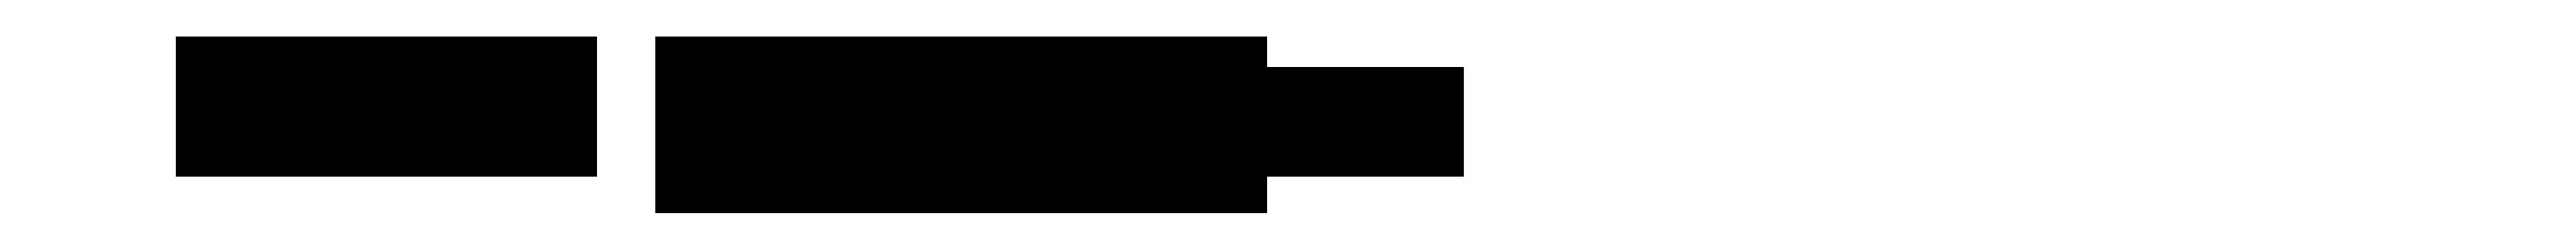 Typeface-Heimat-Stencil-F04-Atlas-Font-Foundry